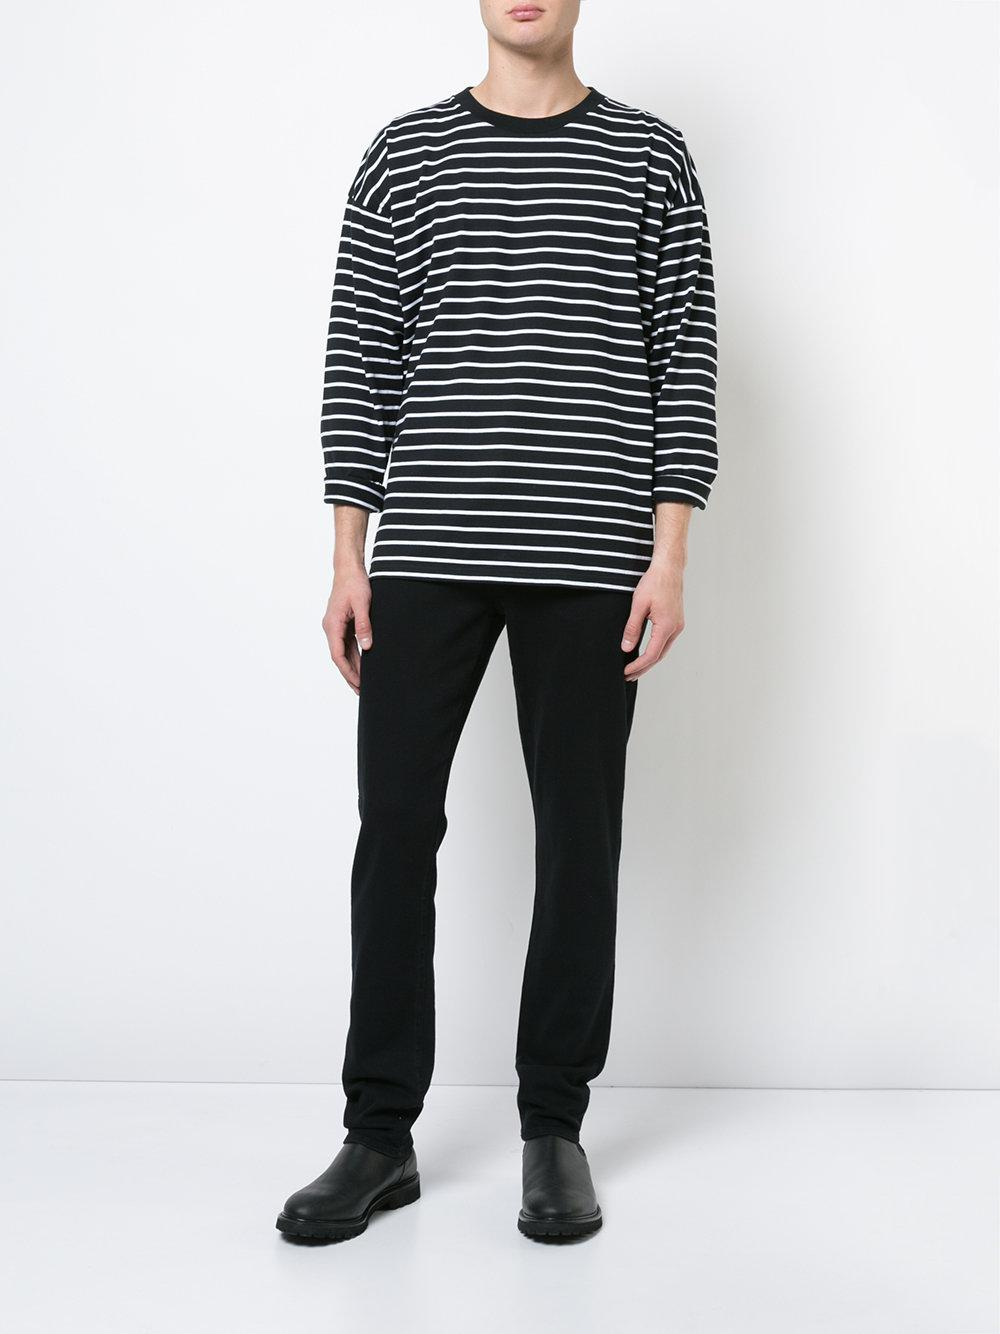 7 For All Mankind Denim Adrien Slim Fit Jeans in Black for Men